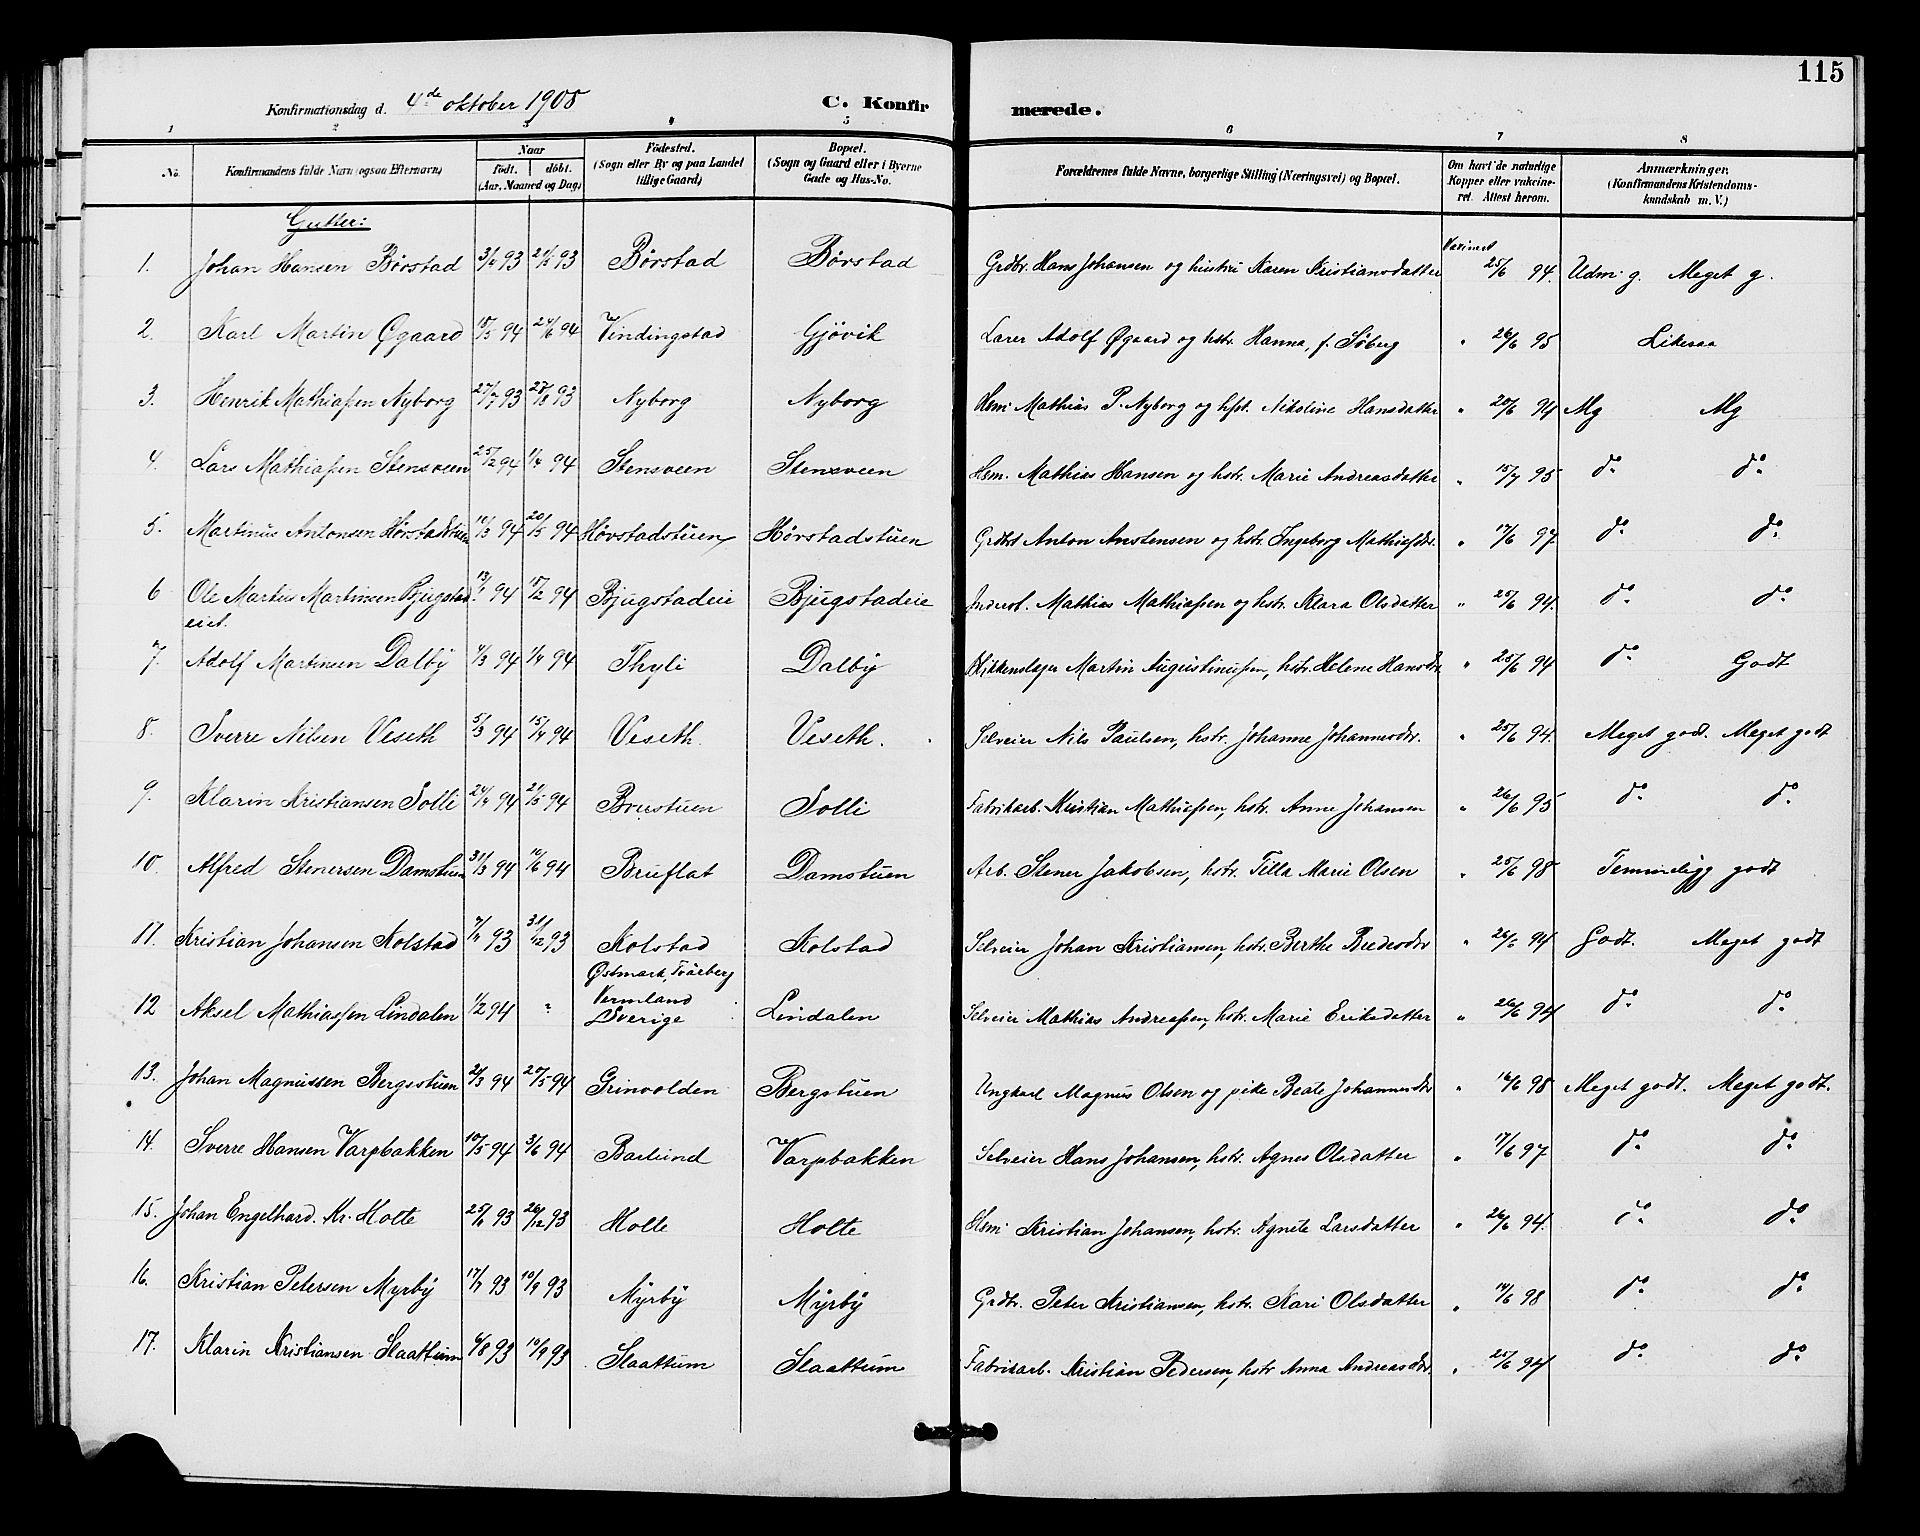 SAH, Vardal prestekontor, H/Ha/Hab/L0011: Klokkerbok nr. 11, 1899-1913, s. 115